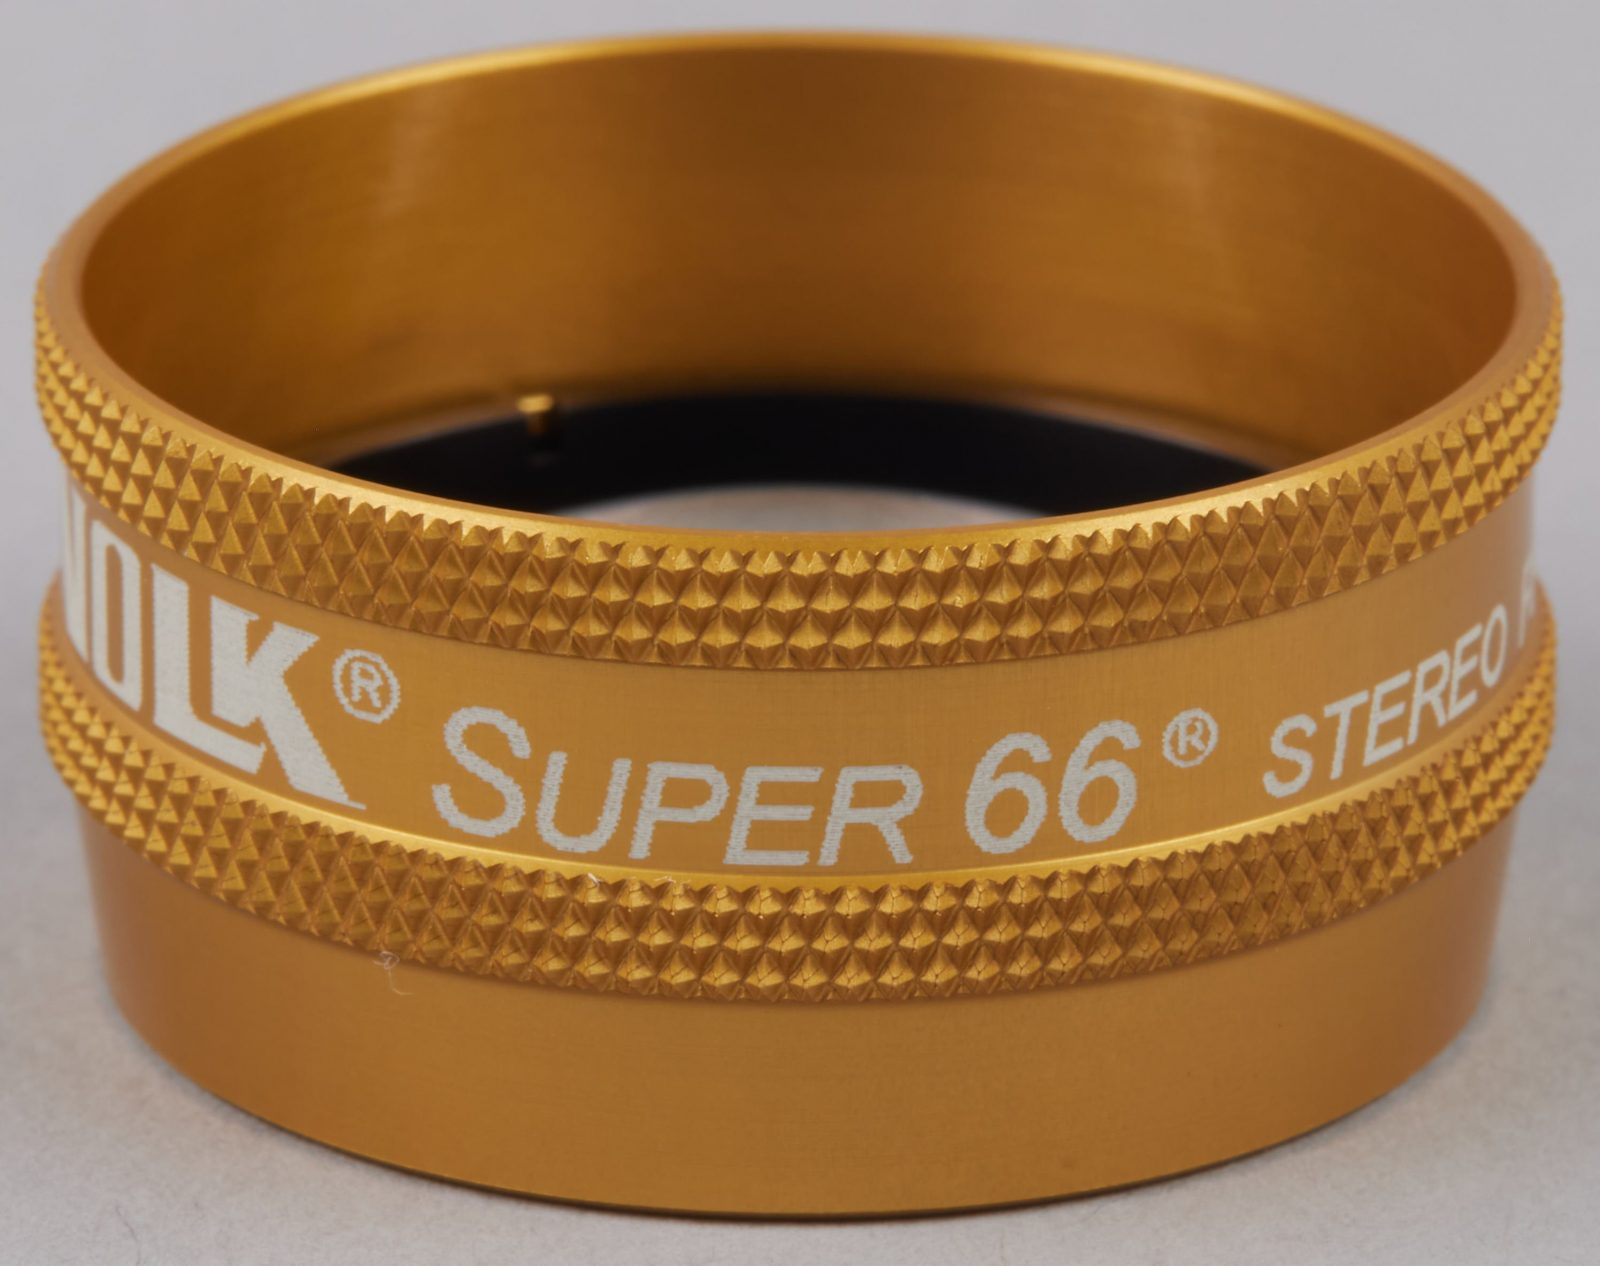 Super 66® (Gold Ring)